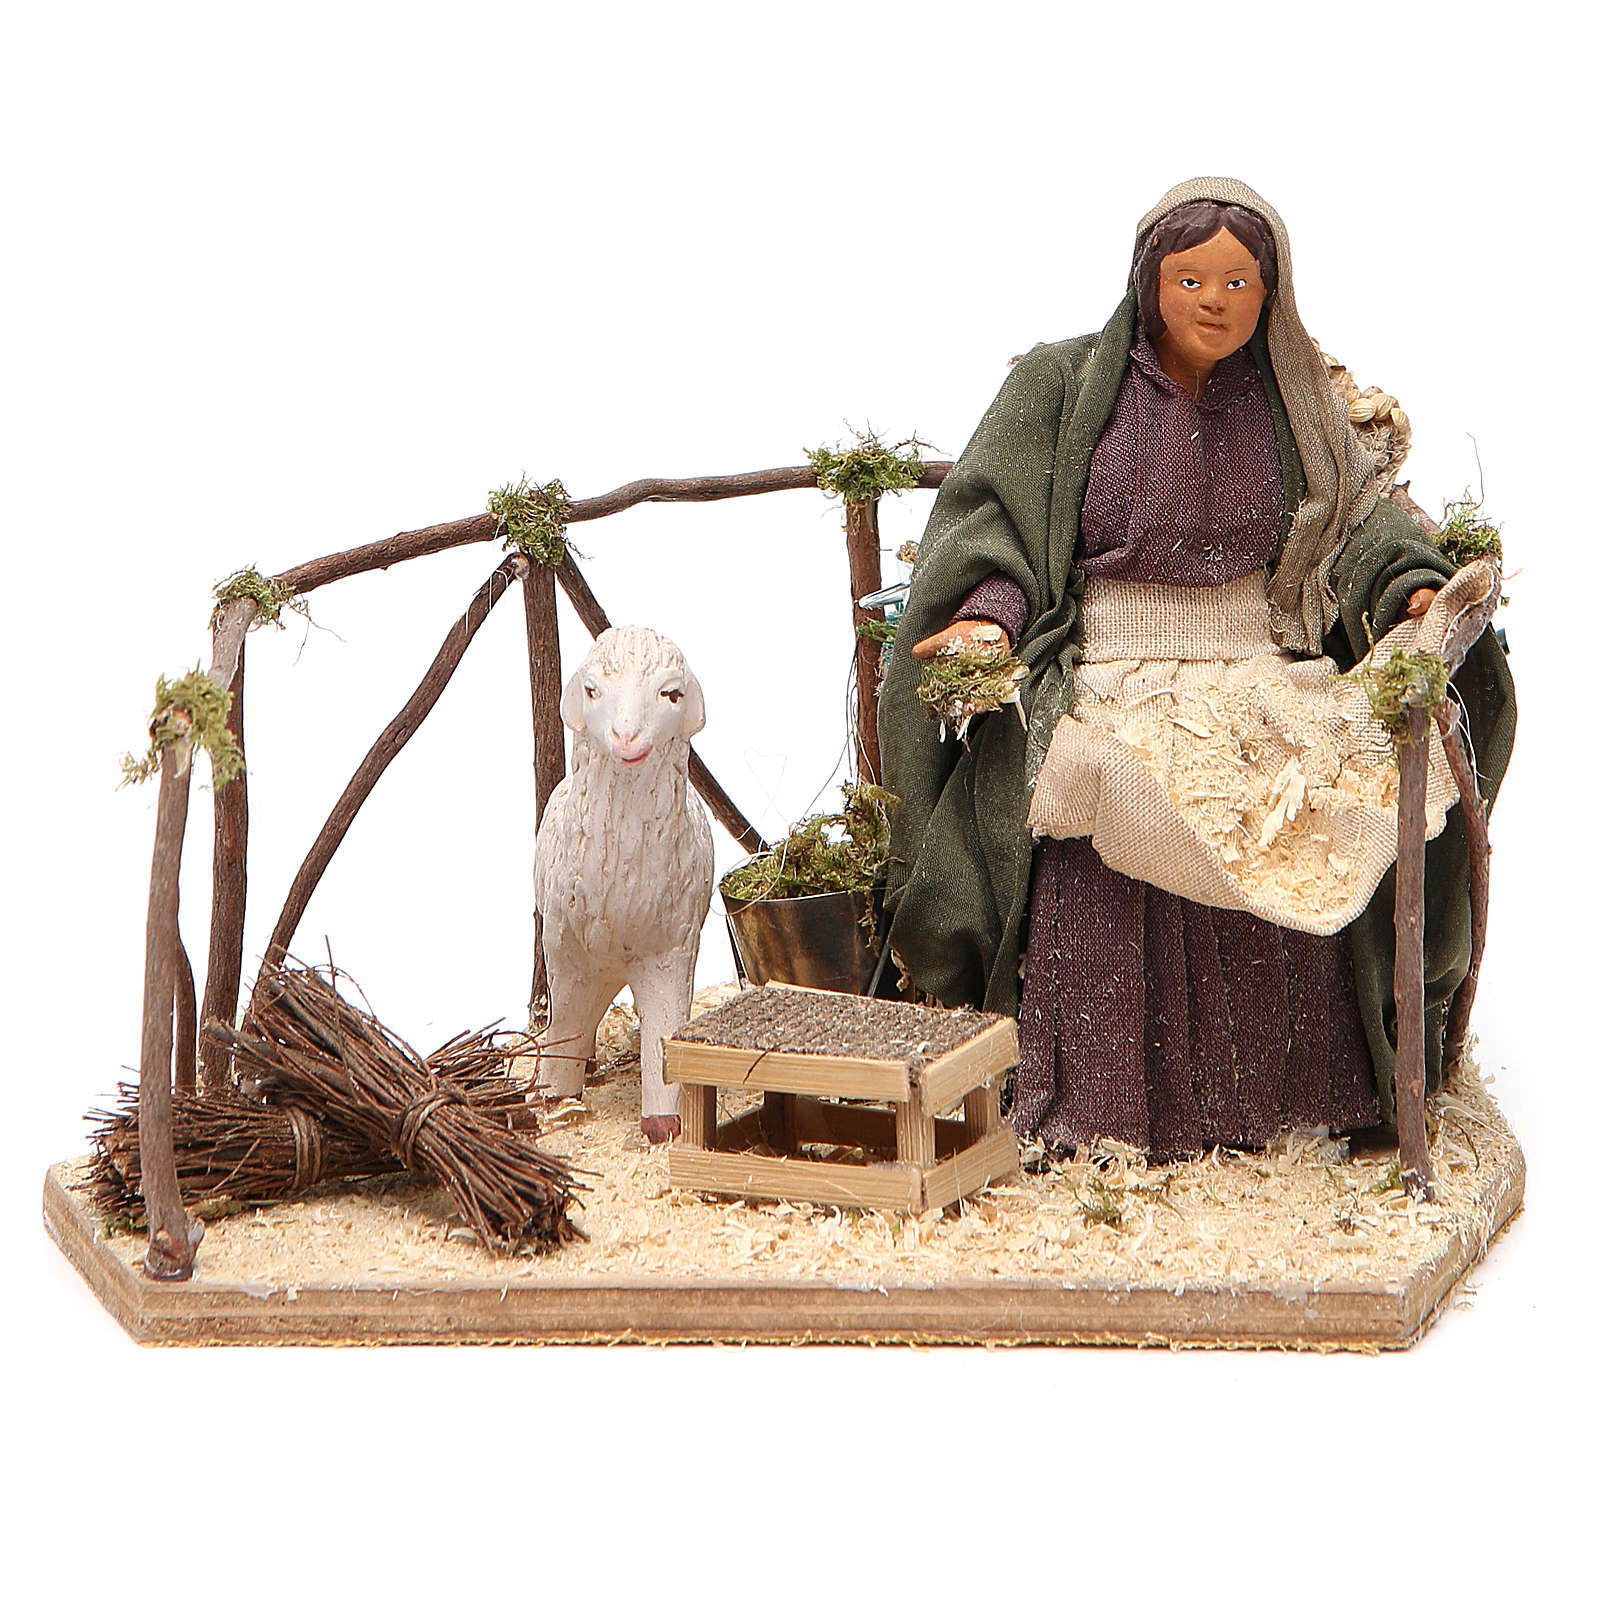 Movimiento mujer con oveja belén de Nápoles 14 cn 4